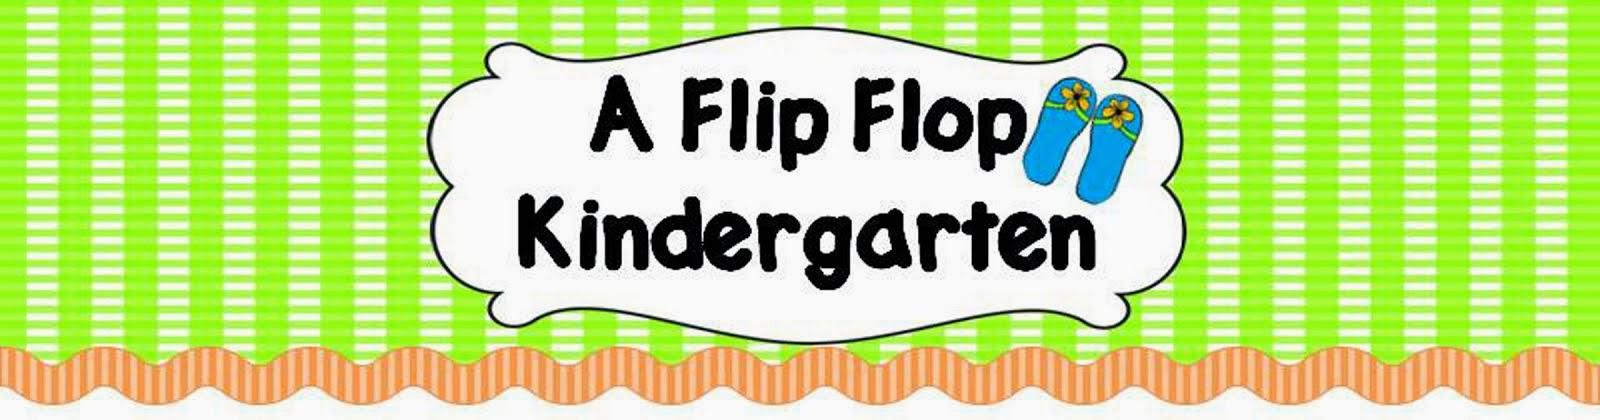 A Flip Flop Kindergarten